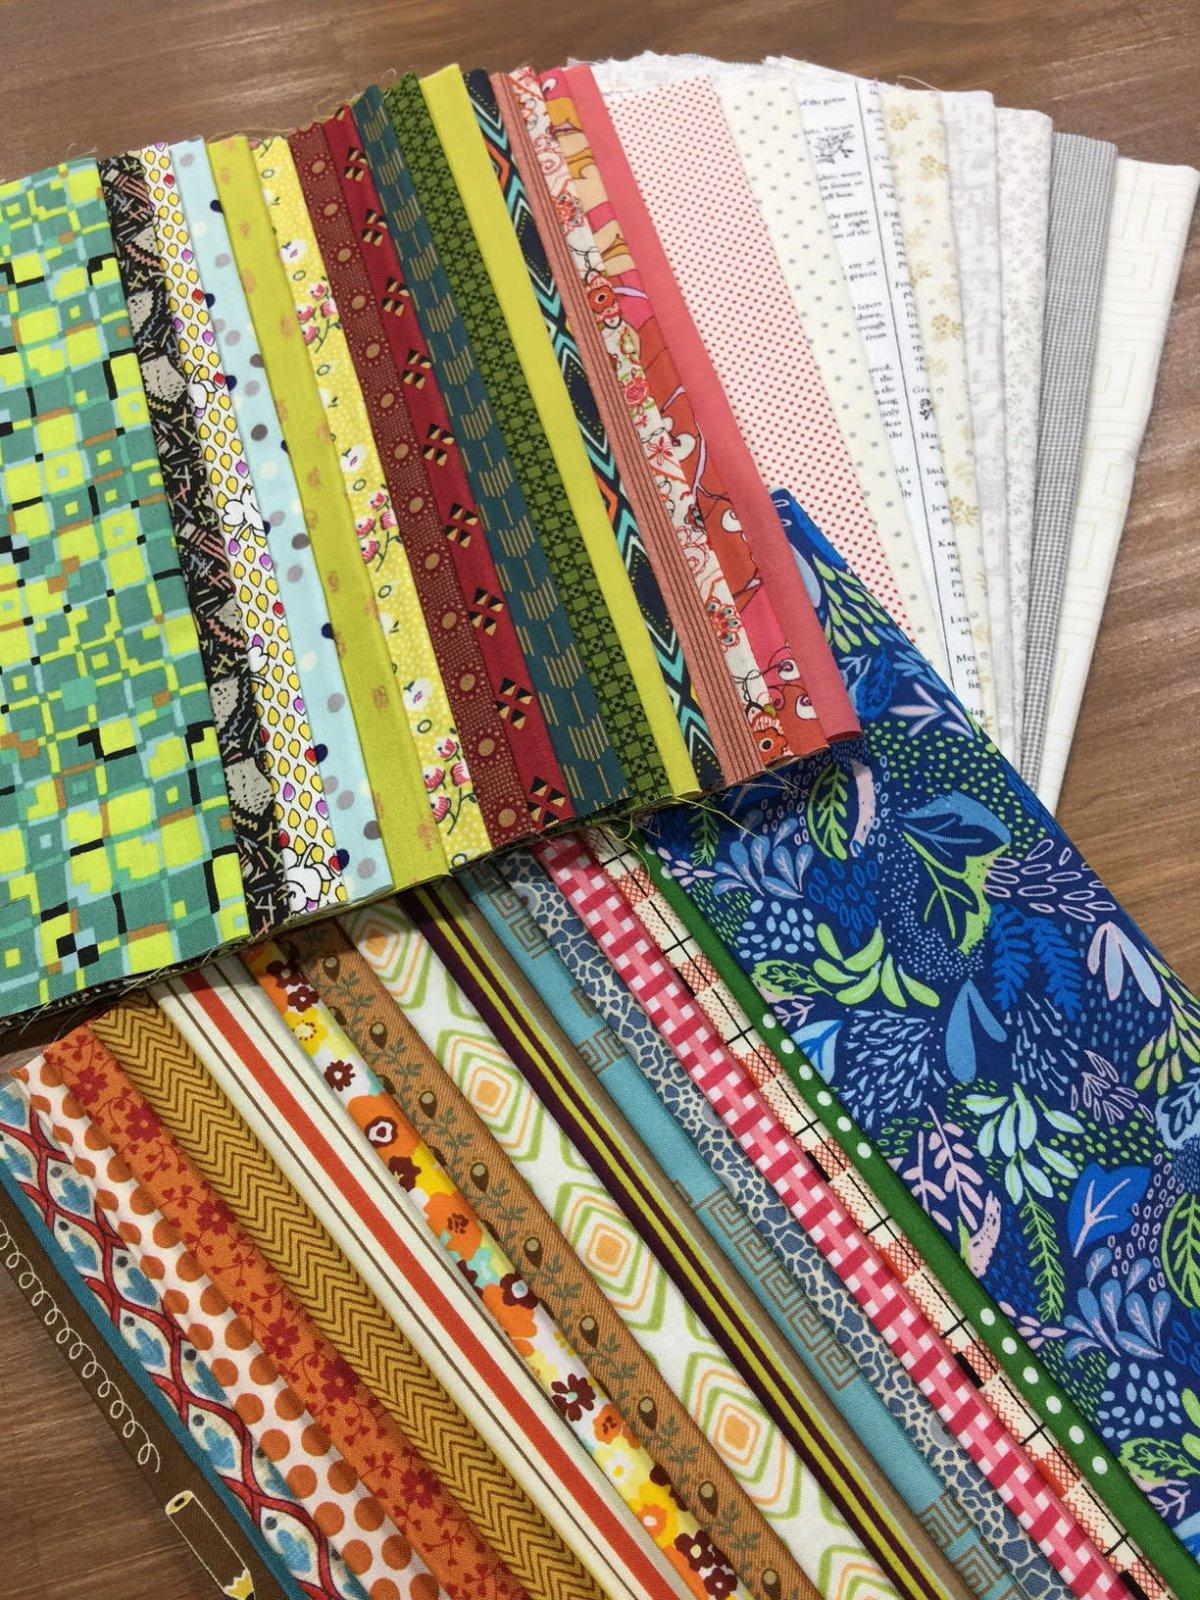 Bring Me Flowers - Starter Kit - Fabric & Pattern Booklet